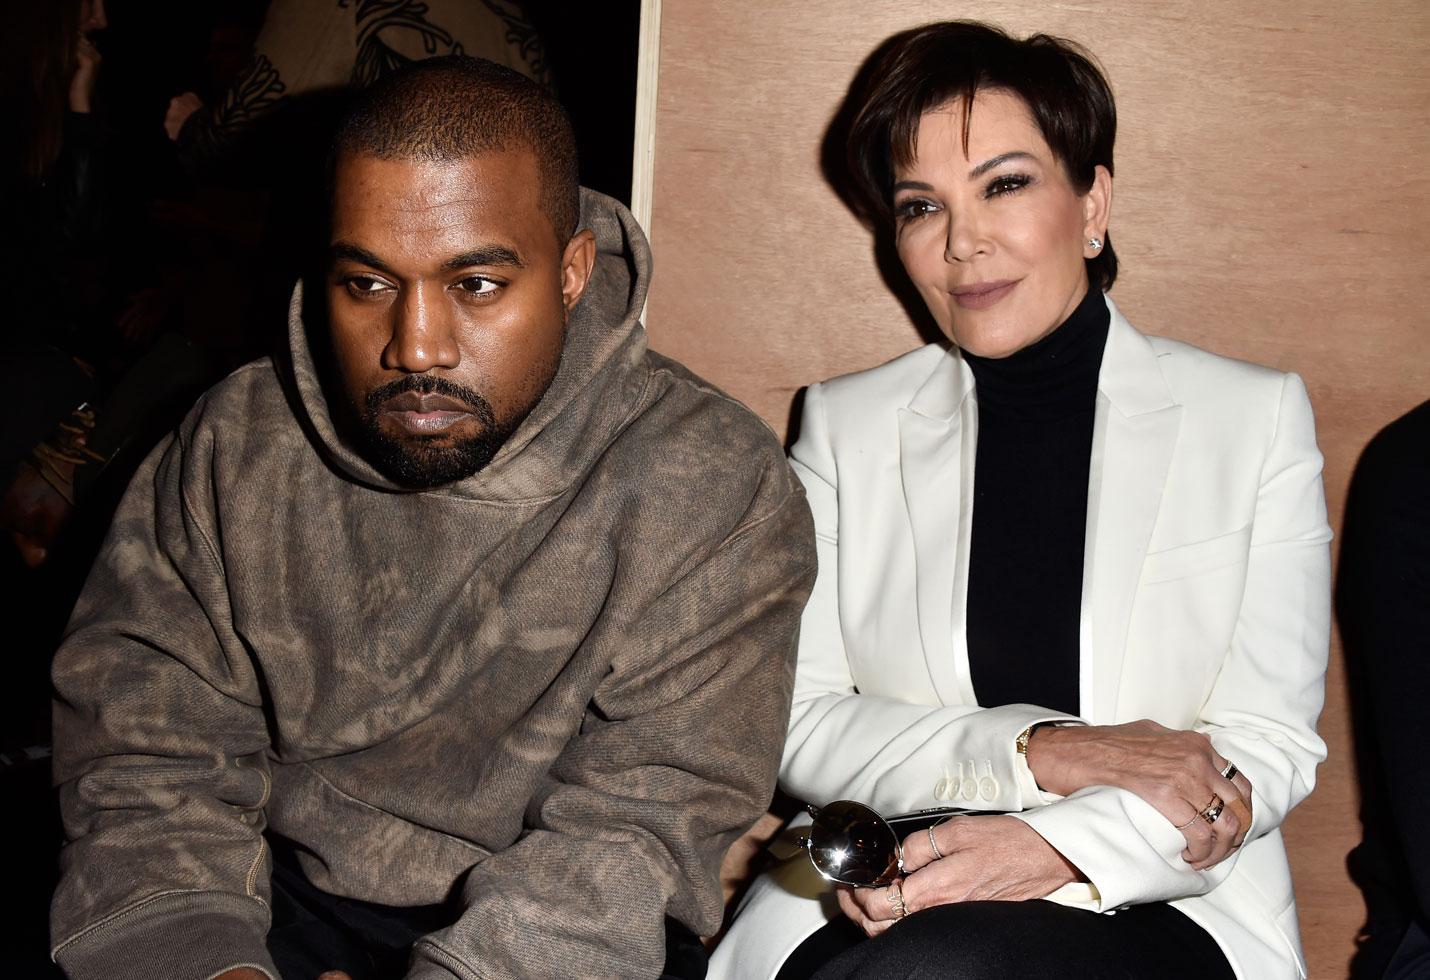 Kris Jenner Kanye West Controversy Politics KUWTK Divorce Rumors Kim Kardashian